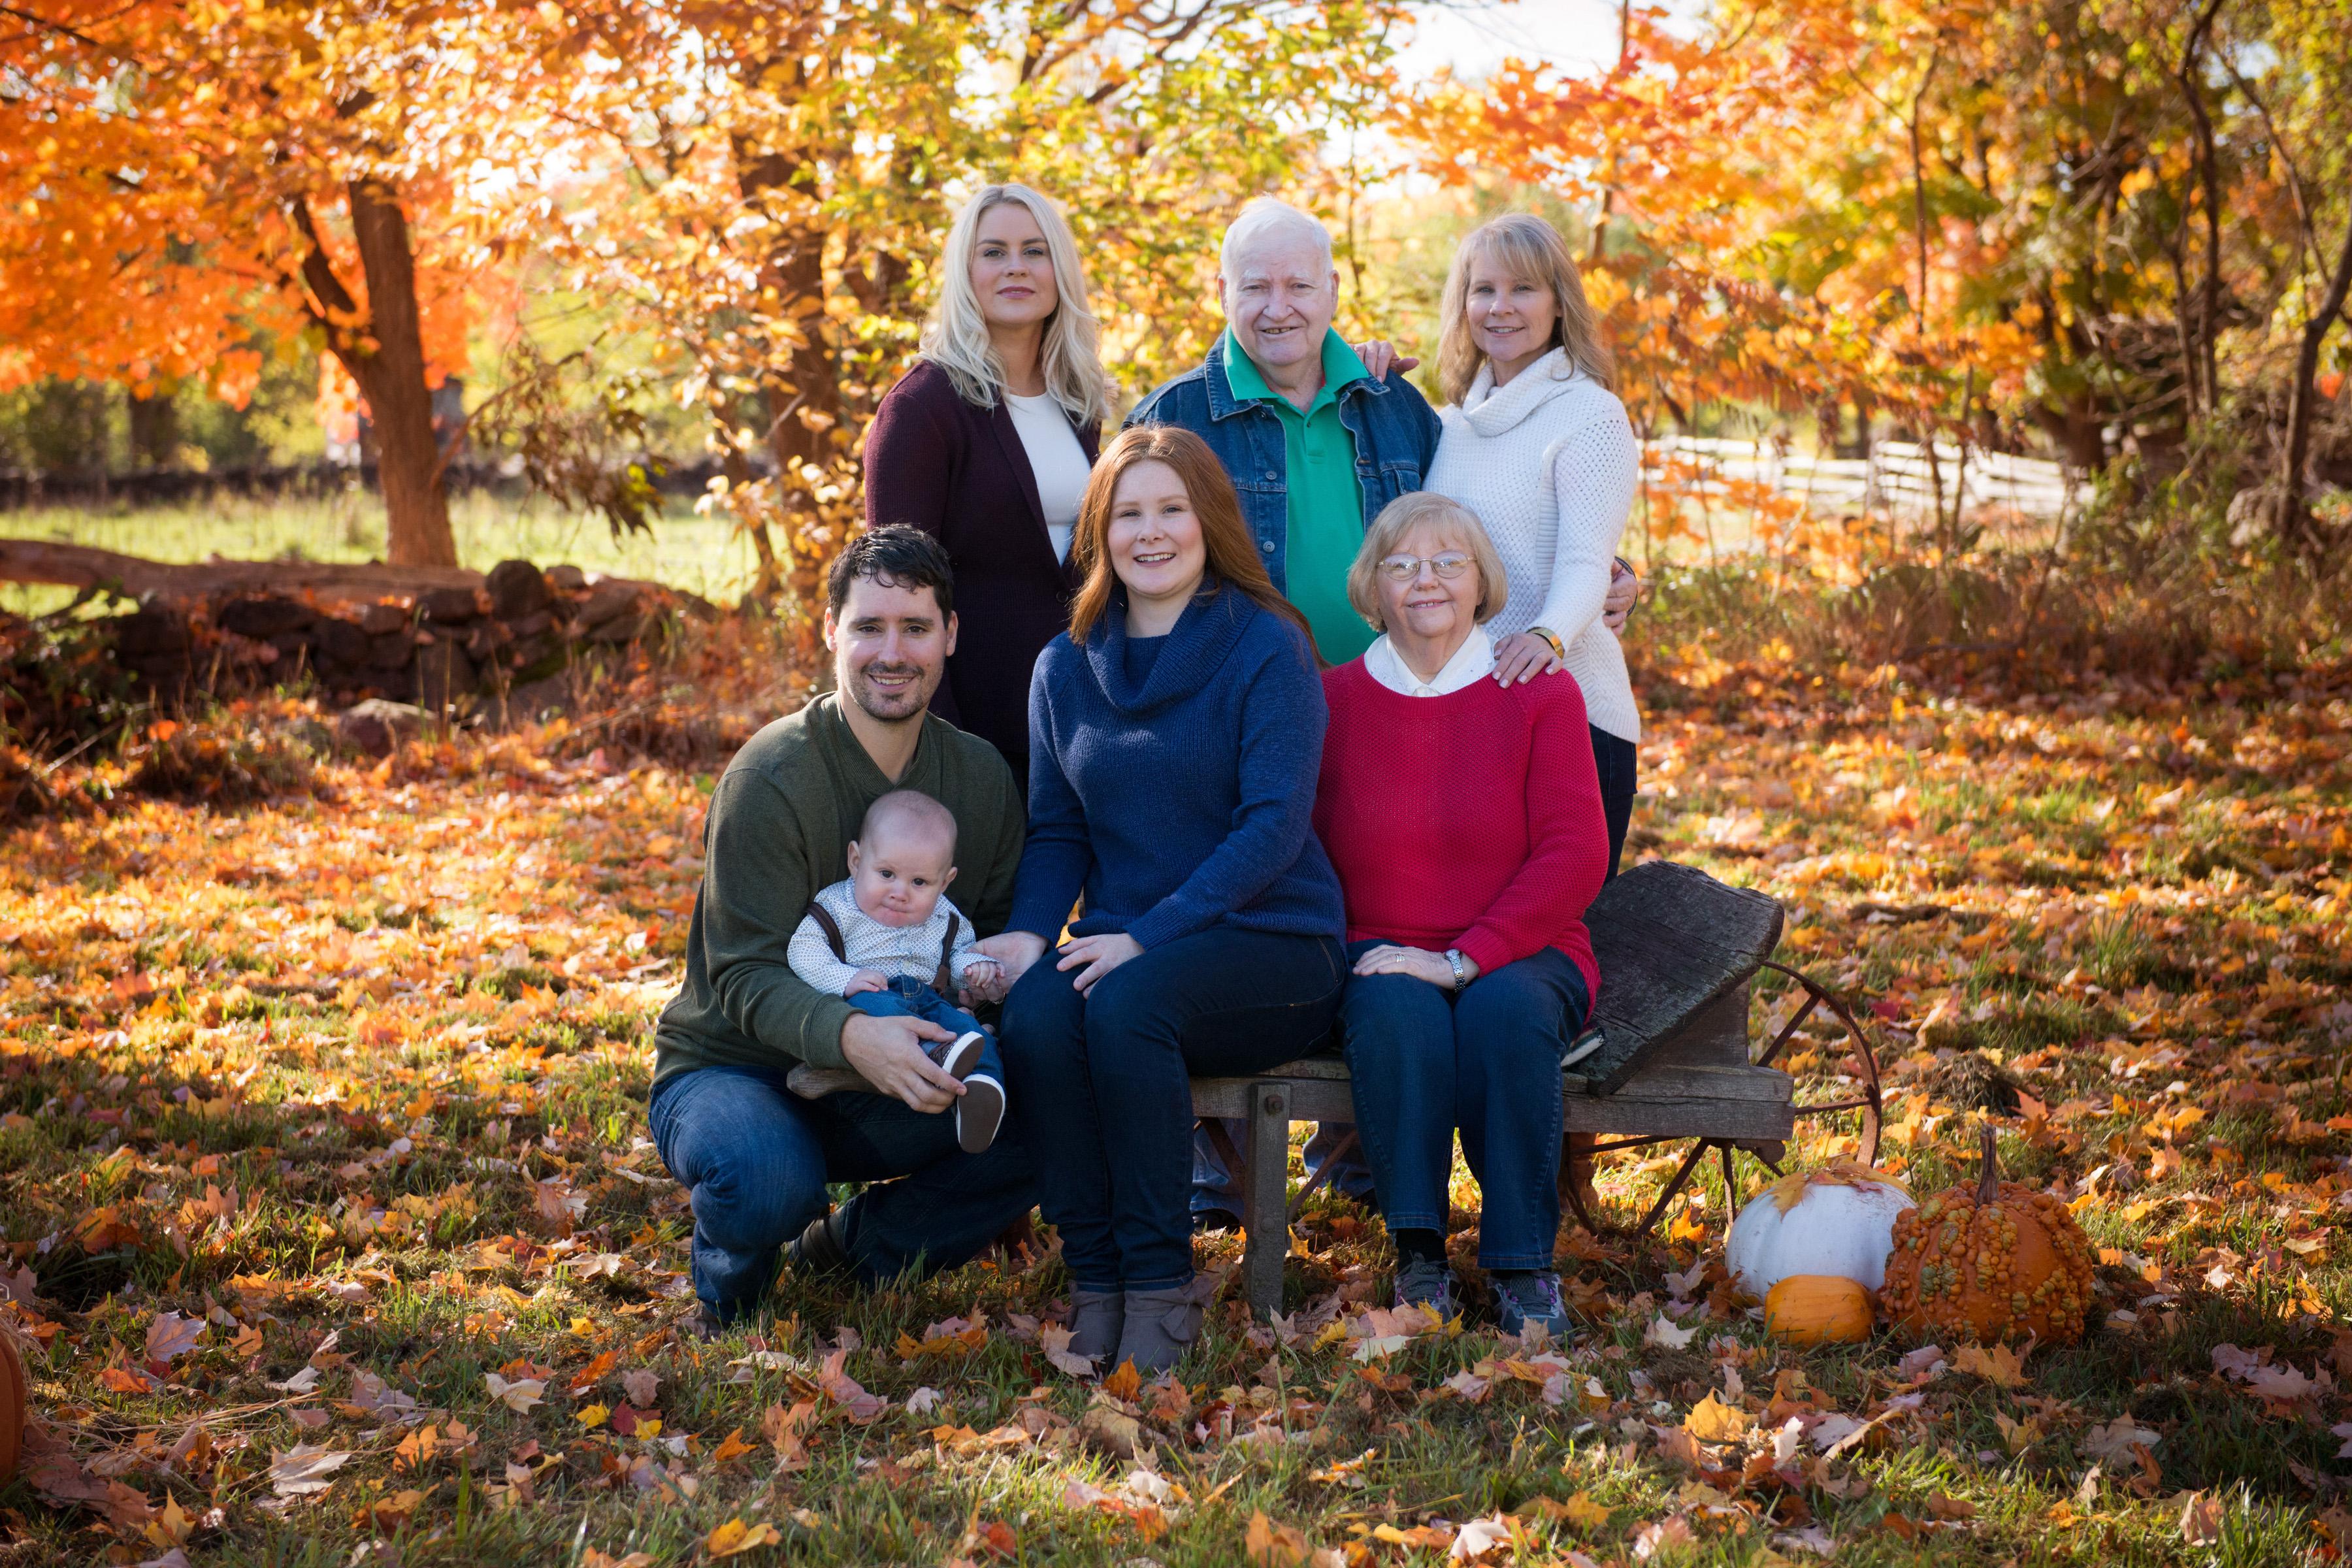 Kalvin6mthfamily025 (1 of 1)